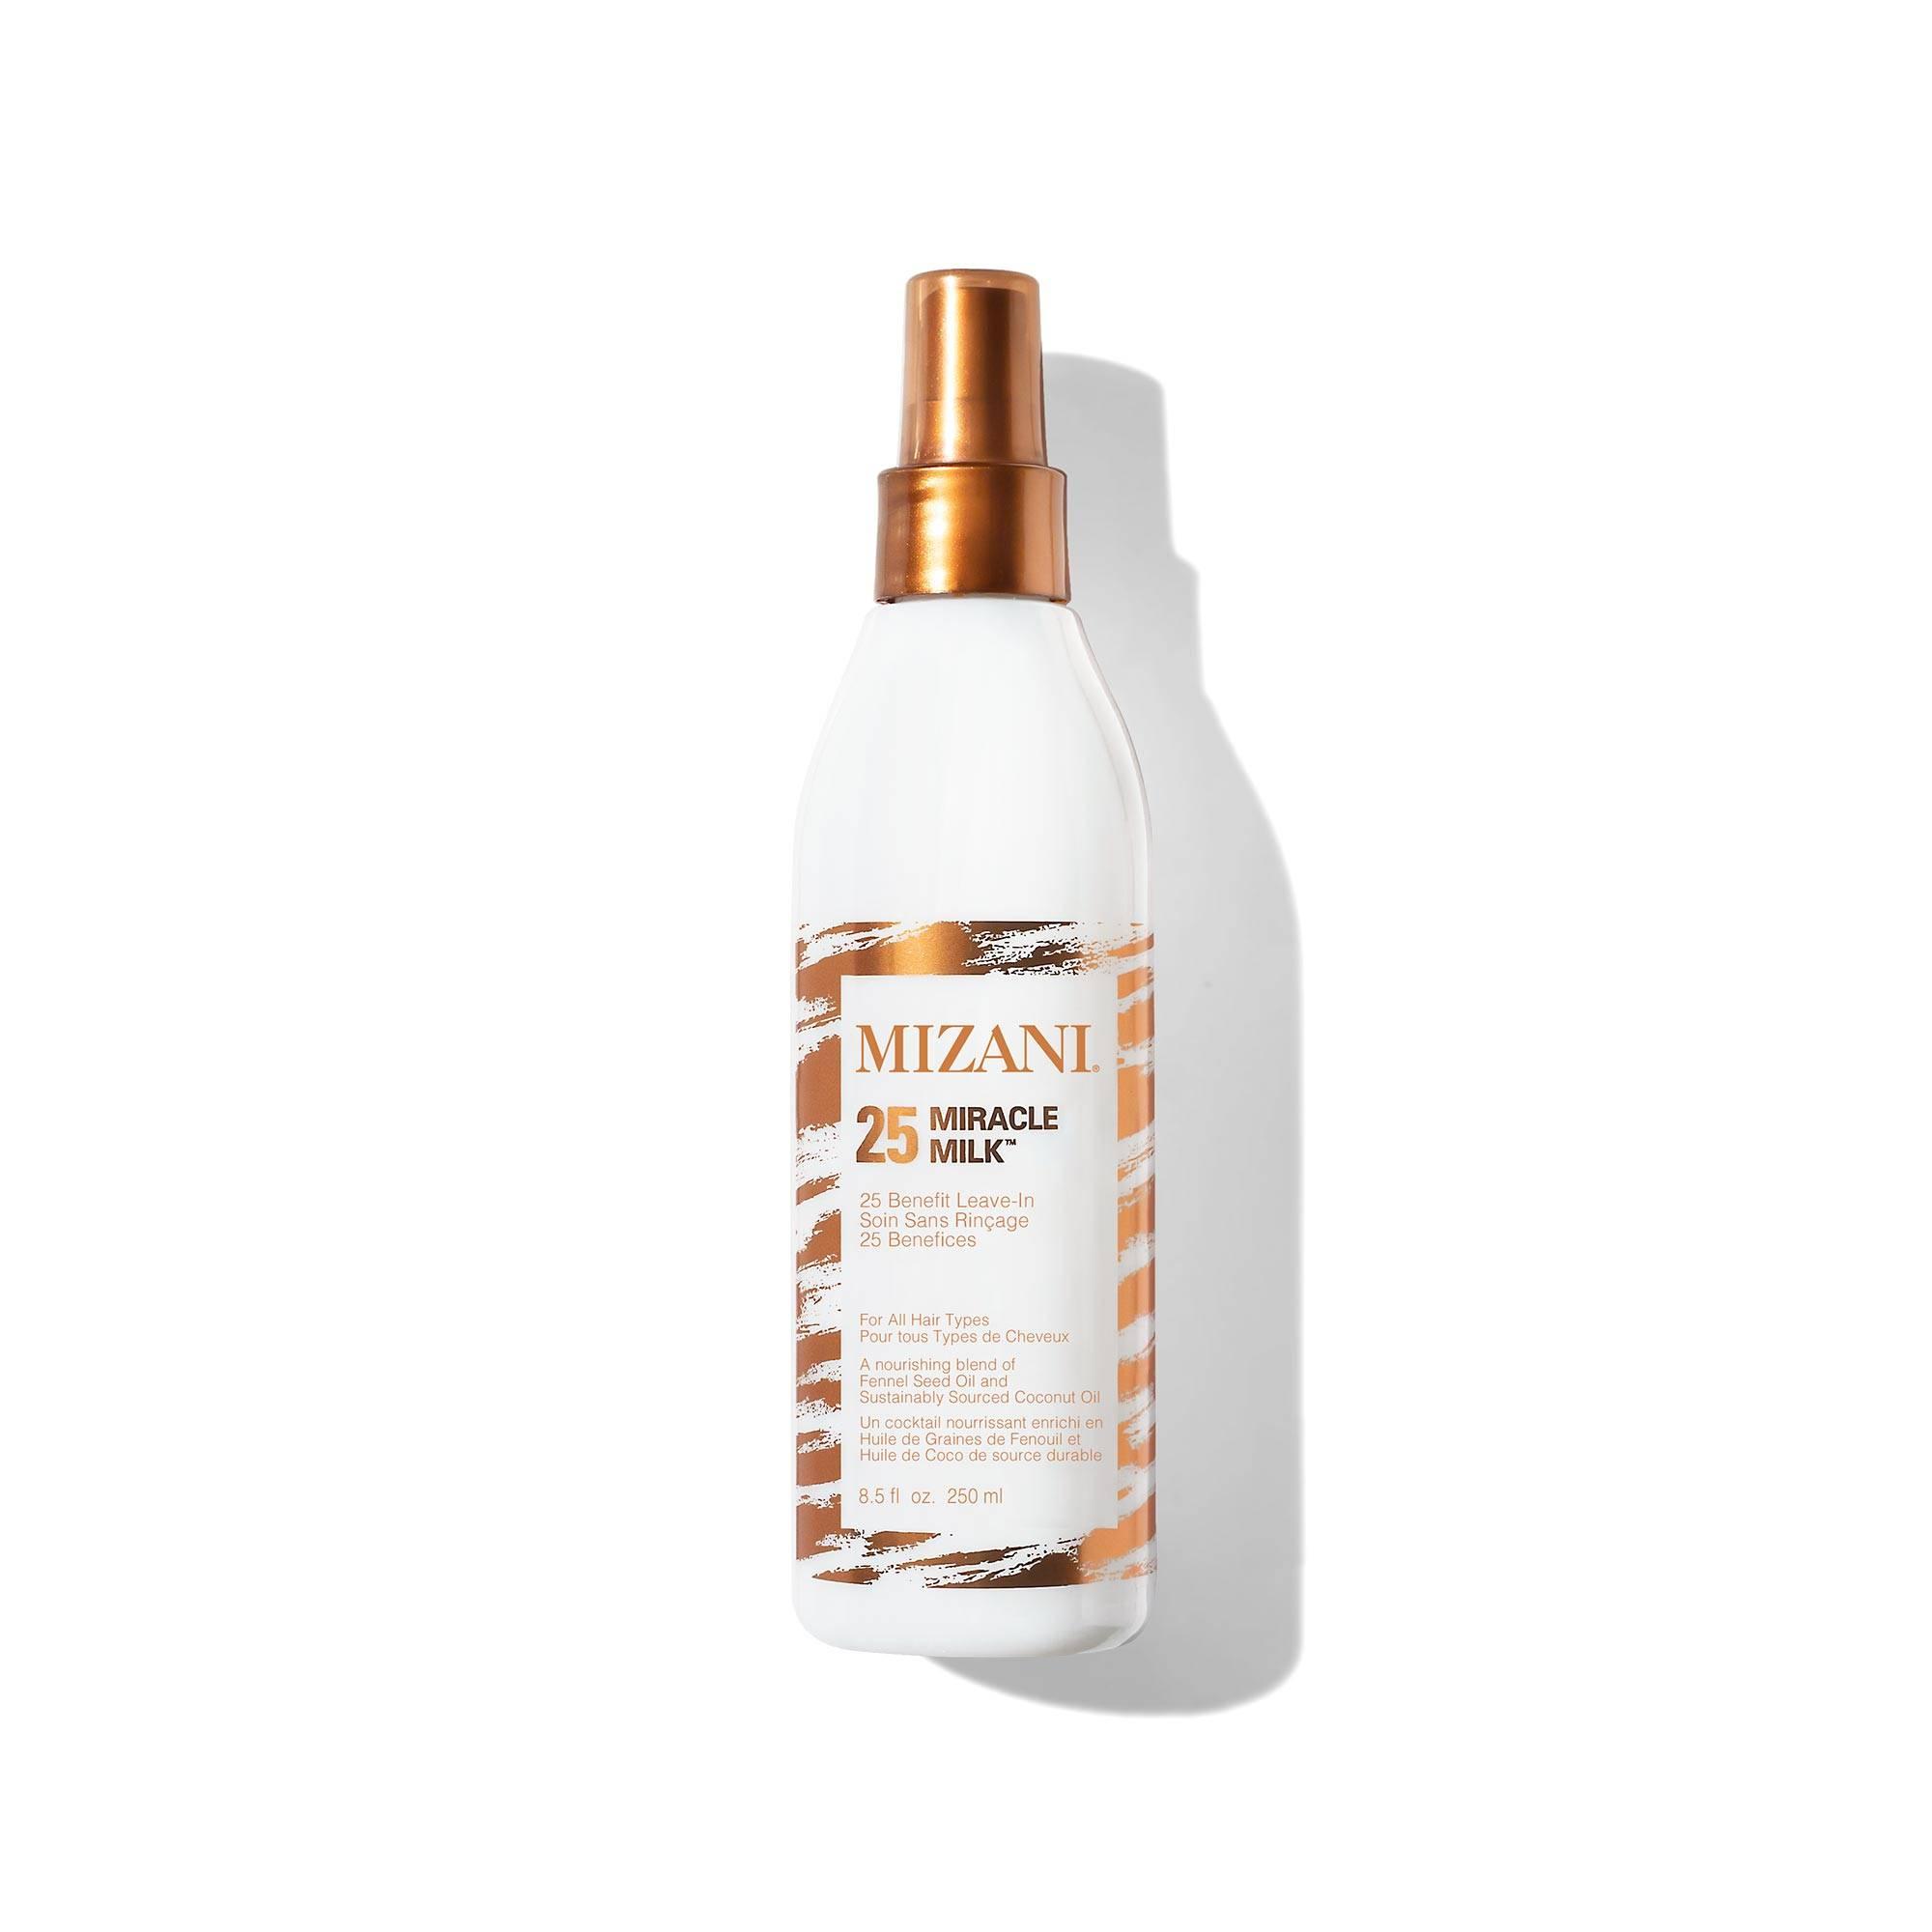 25 Miracle Milk | Mizani | retailbox.co.za